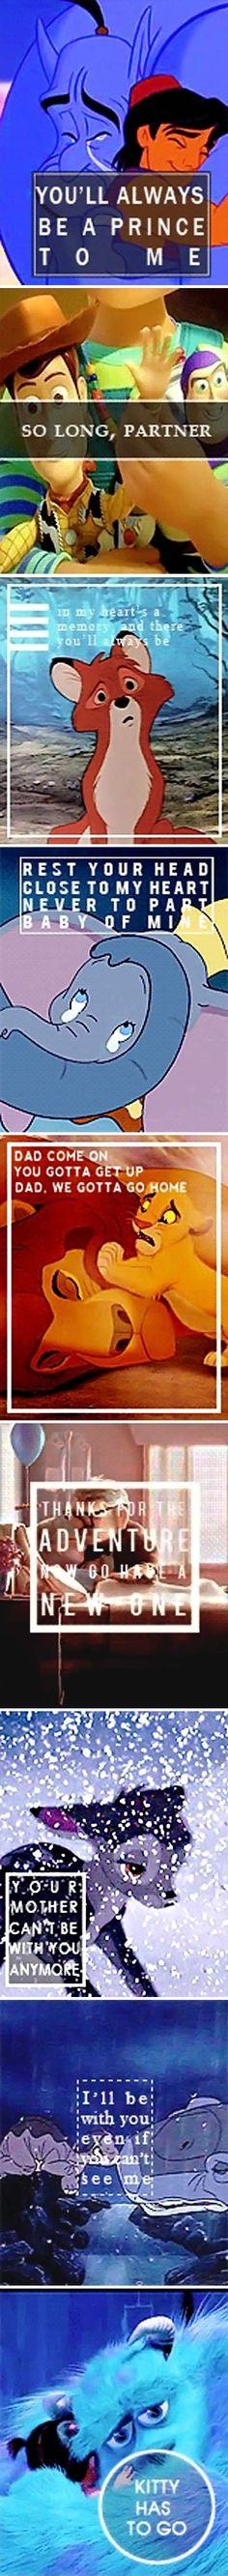 Heartbreaking Disney lines.